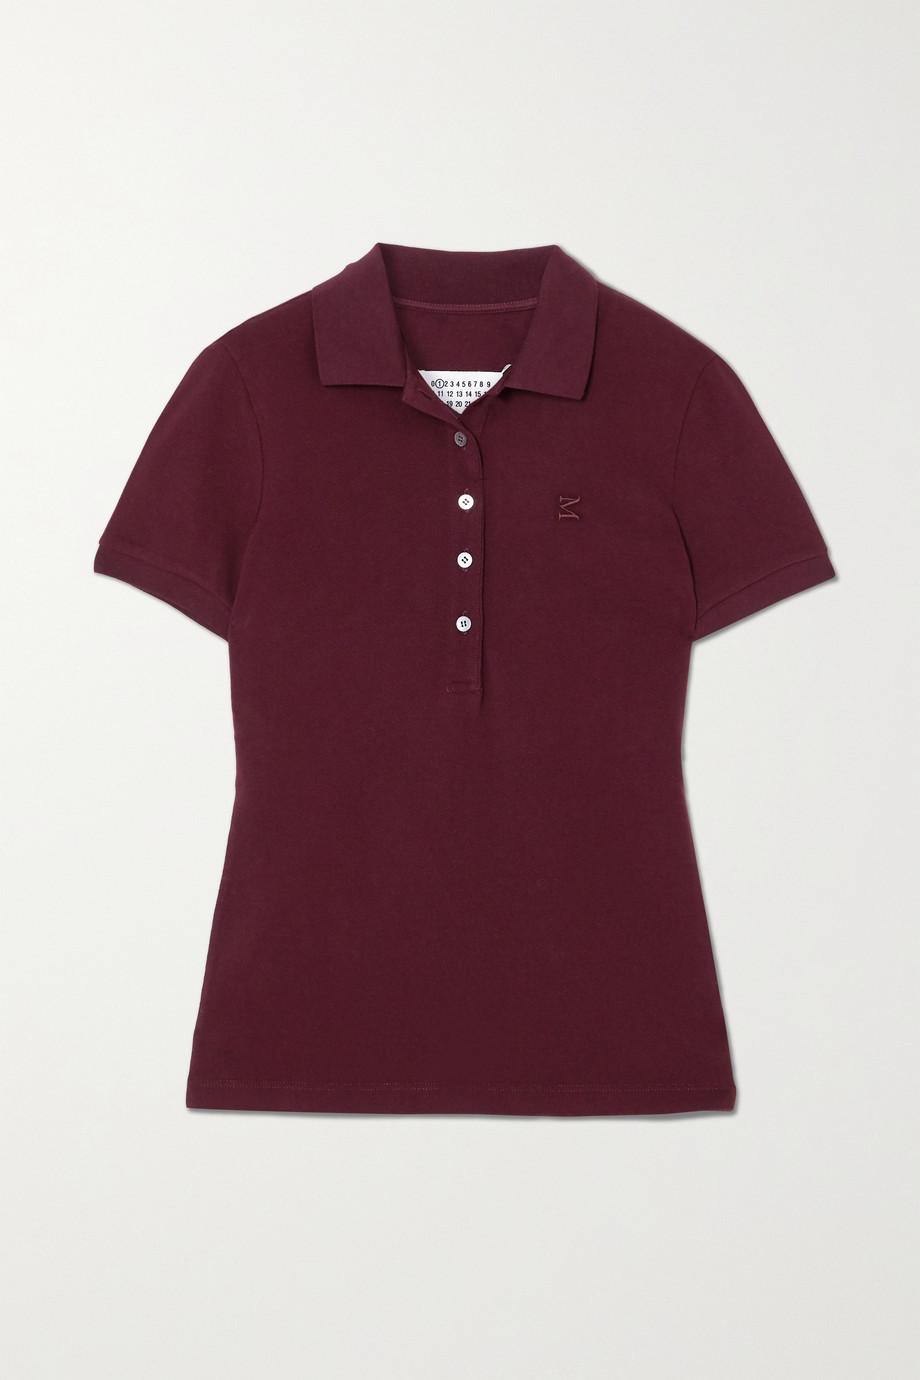 Maison Margiela Embroidered cotton-piqué polo shirt